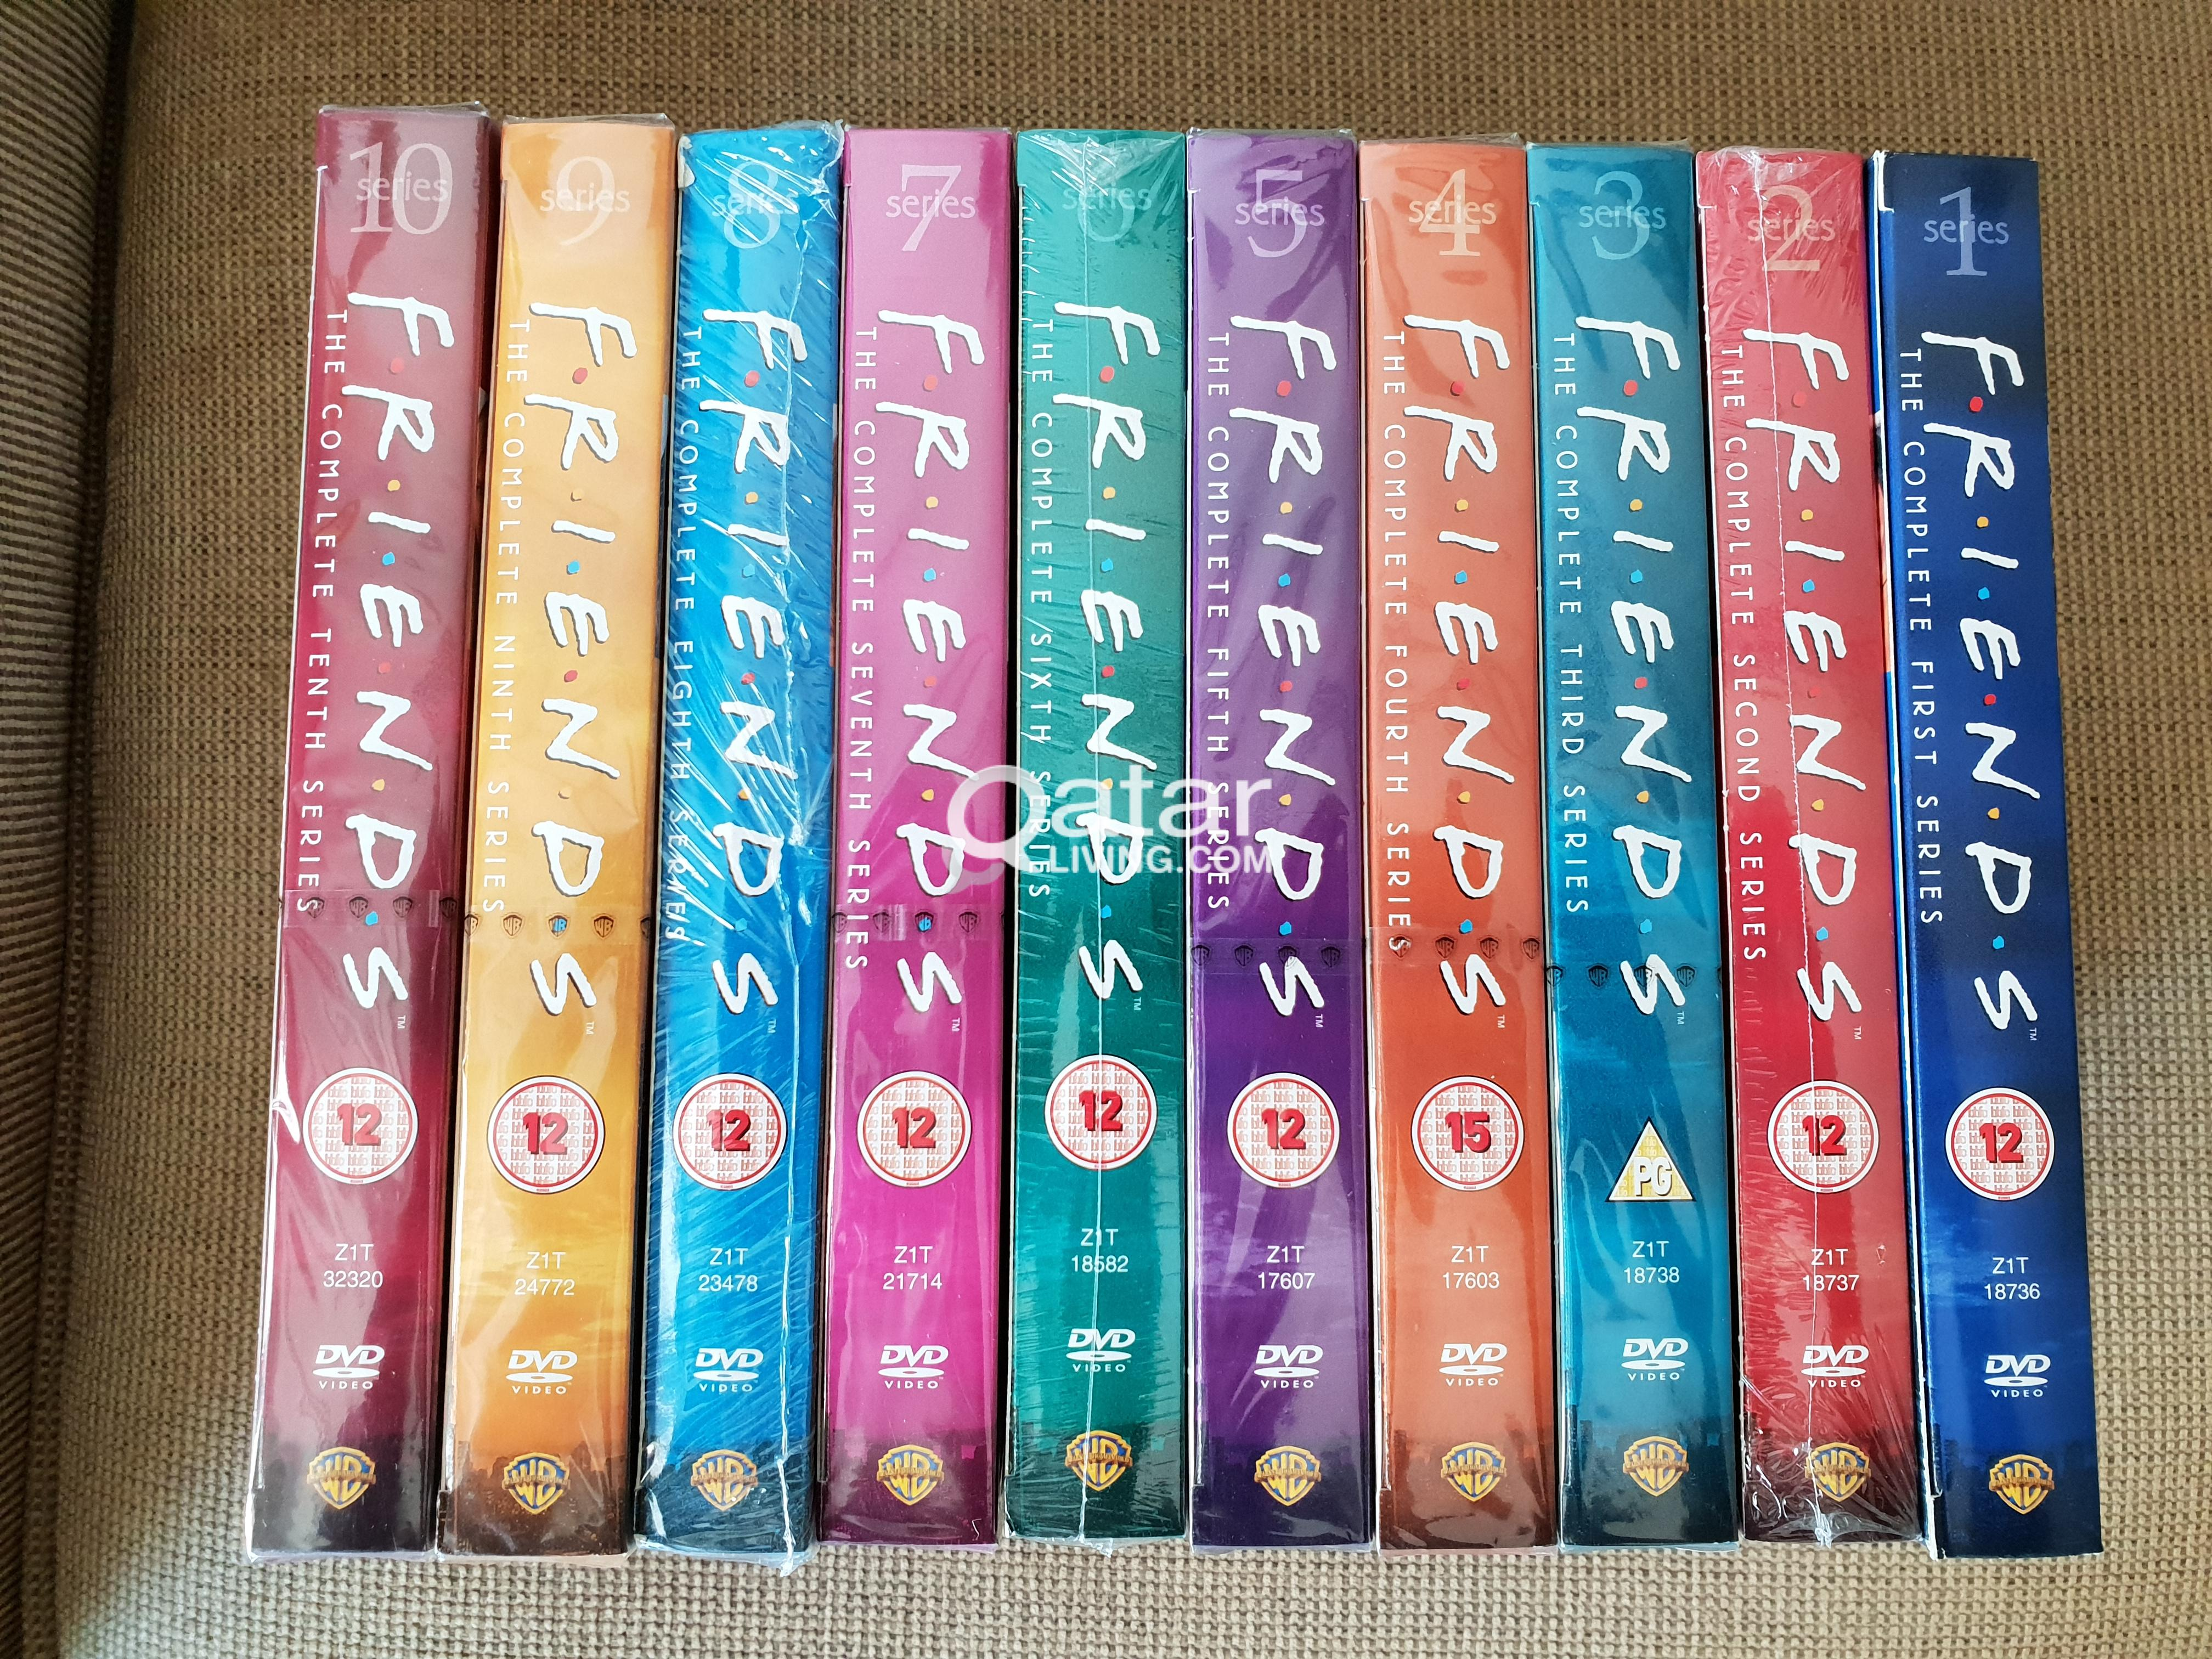 Sony DVD player + All Seasons of Friends TV series | Qatar Living